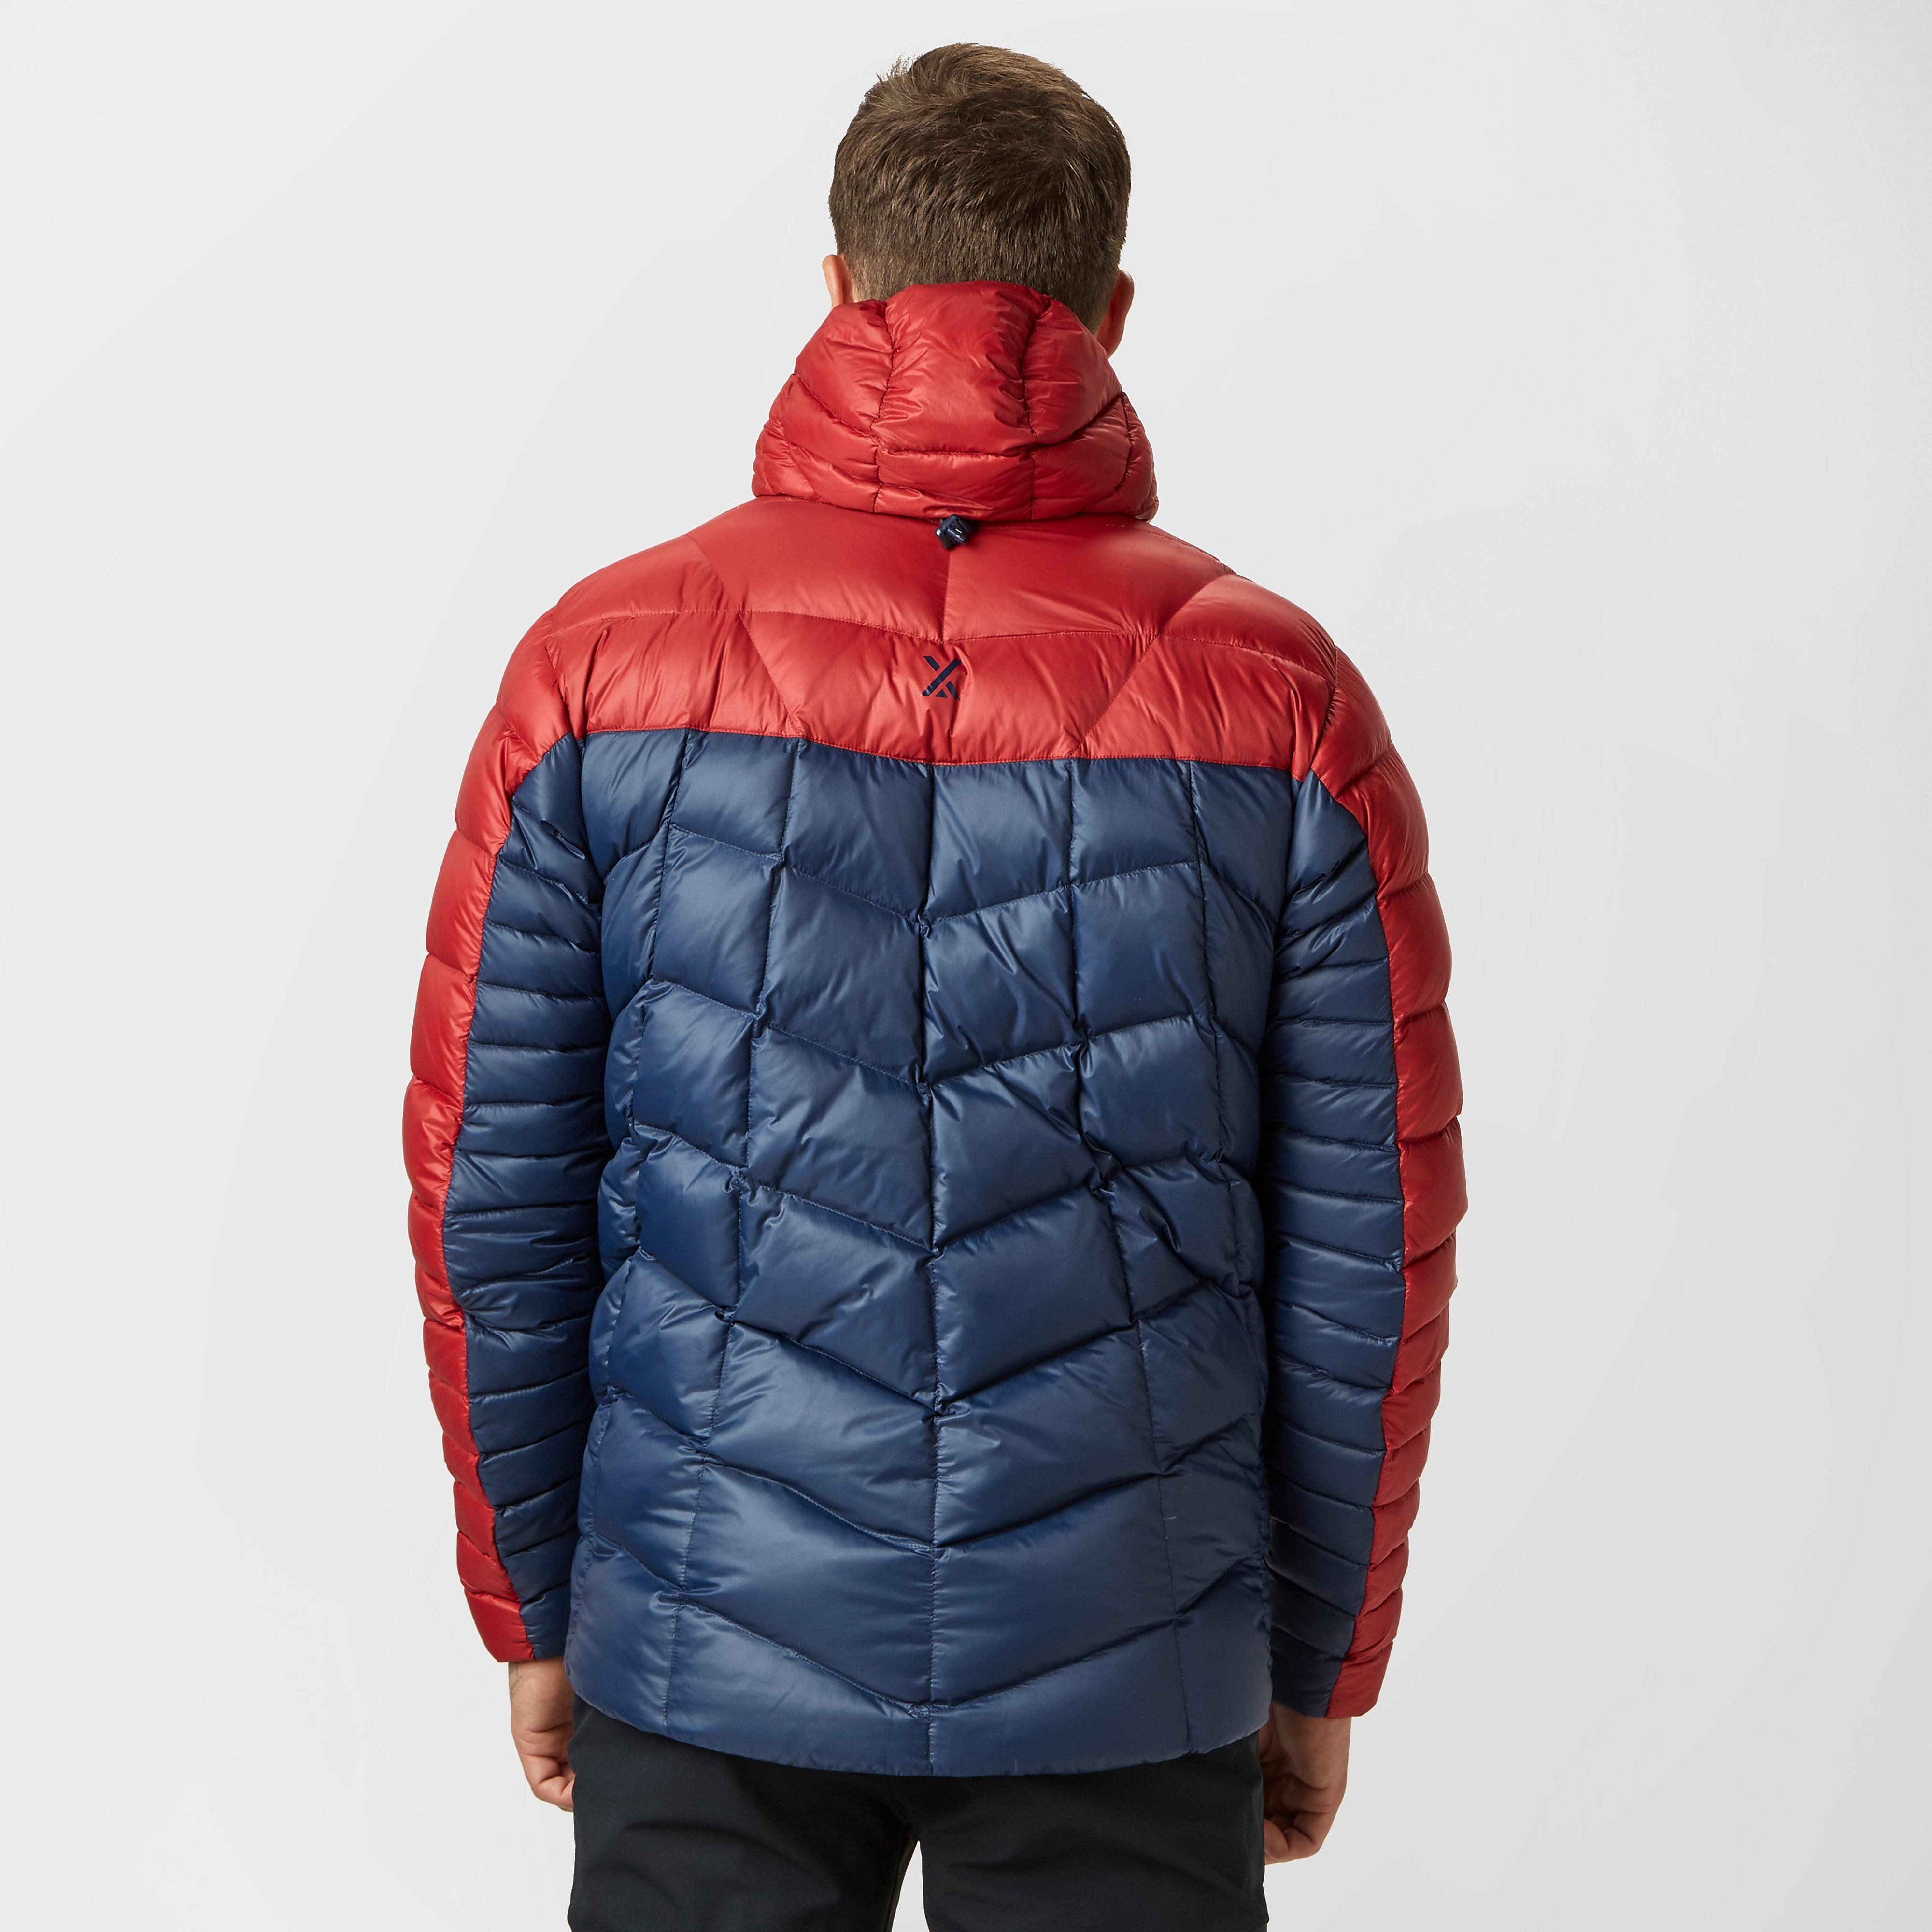 Berghaus Men's Nunat Reflect Insulated Jacket